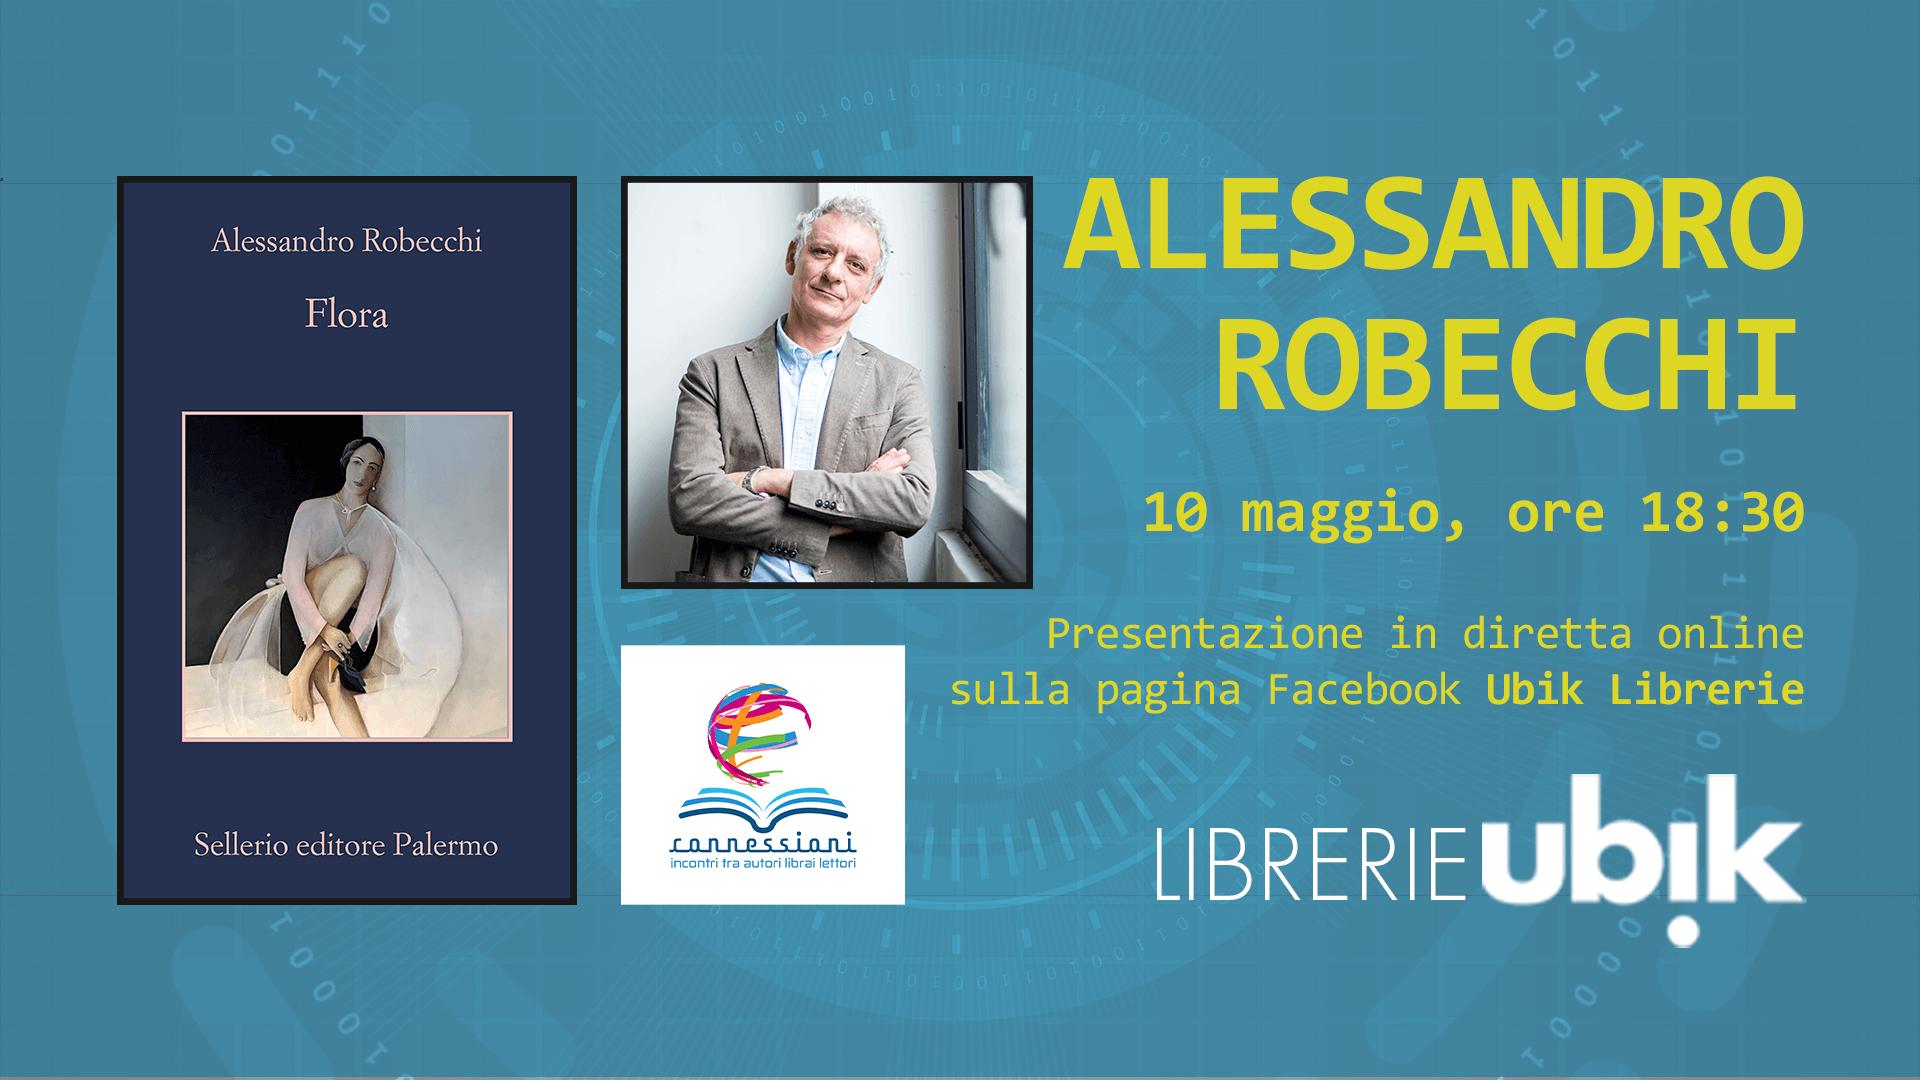 ALESSANDRO ROBECCHI presenta in diretat online